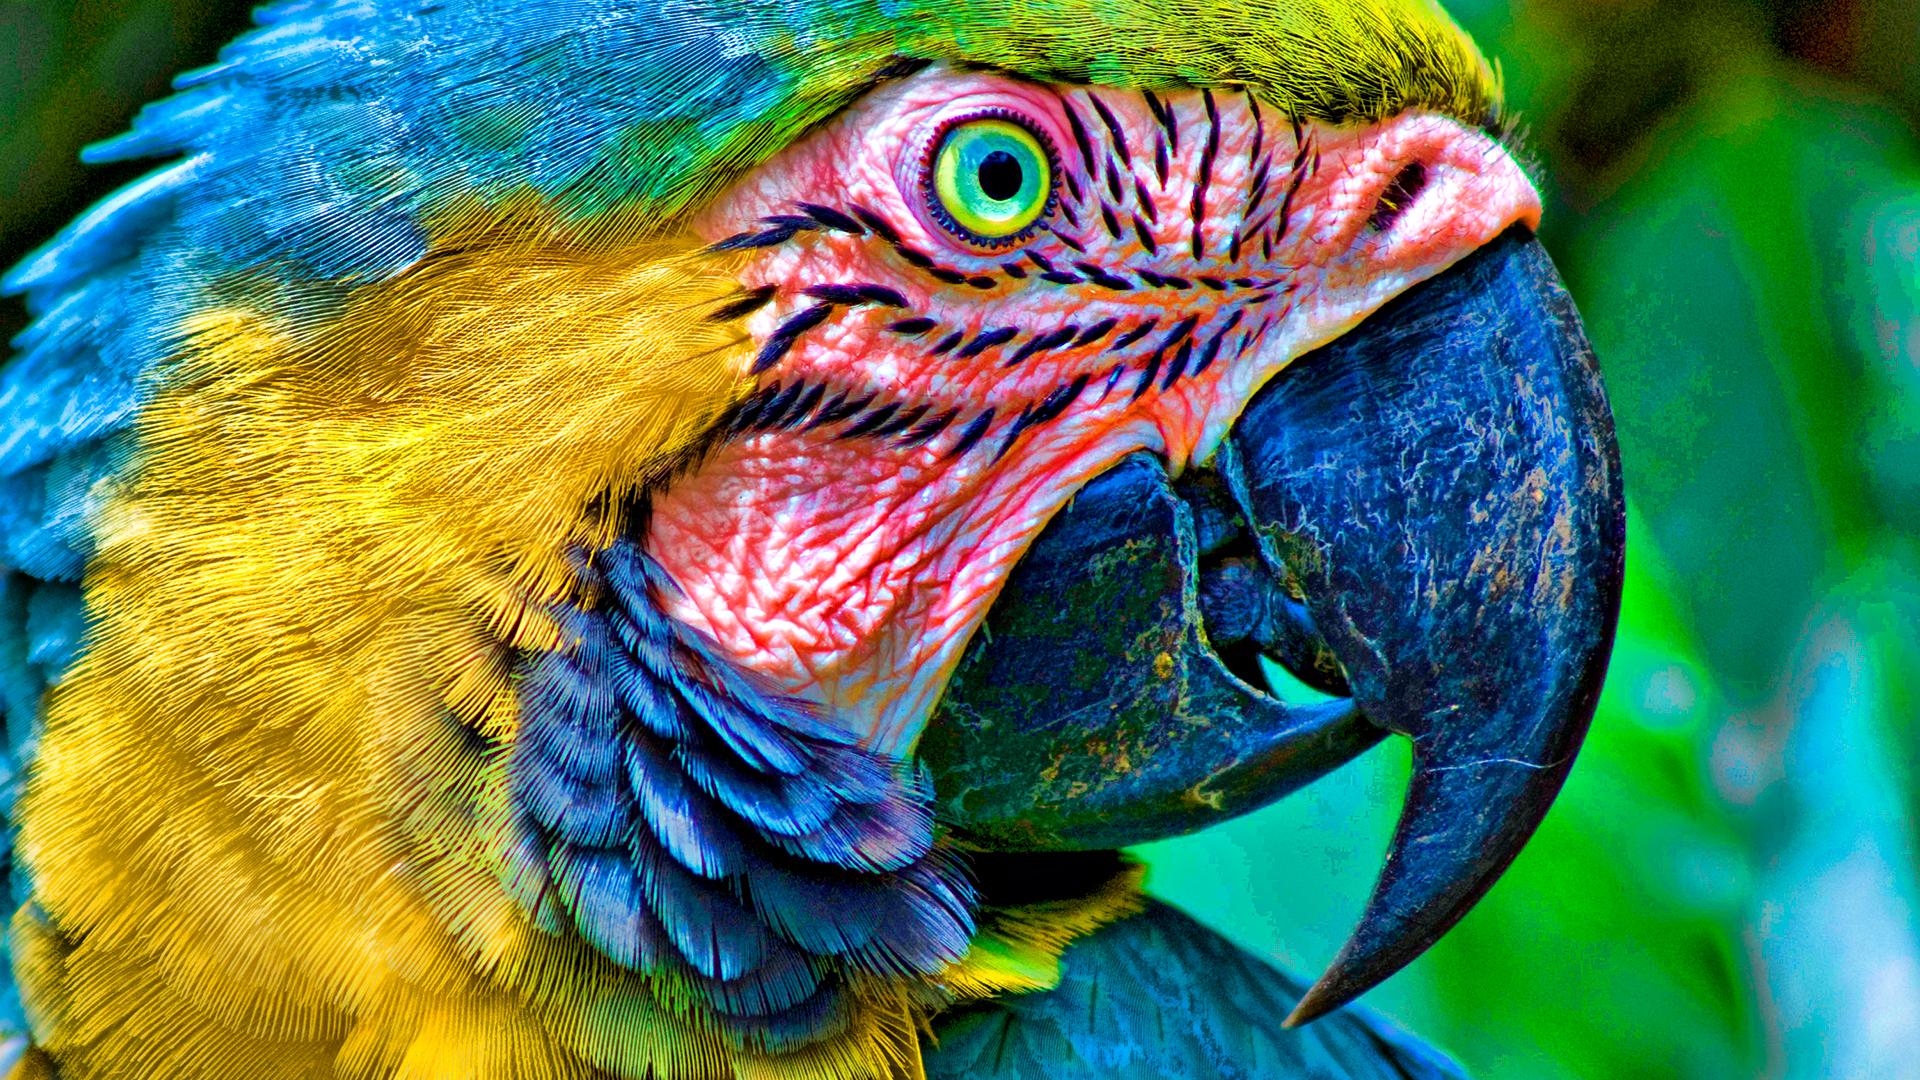 Parrot Desktop Wallpapers FREE on Latorocom 1920x1080